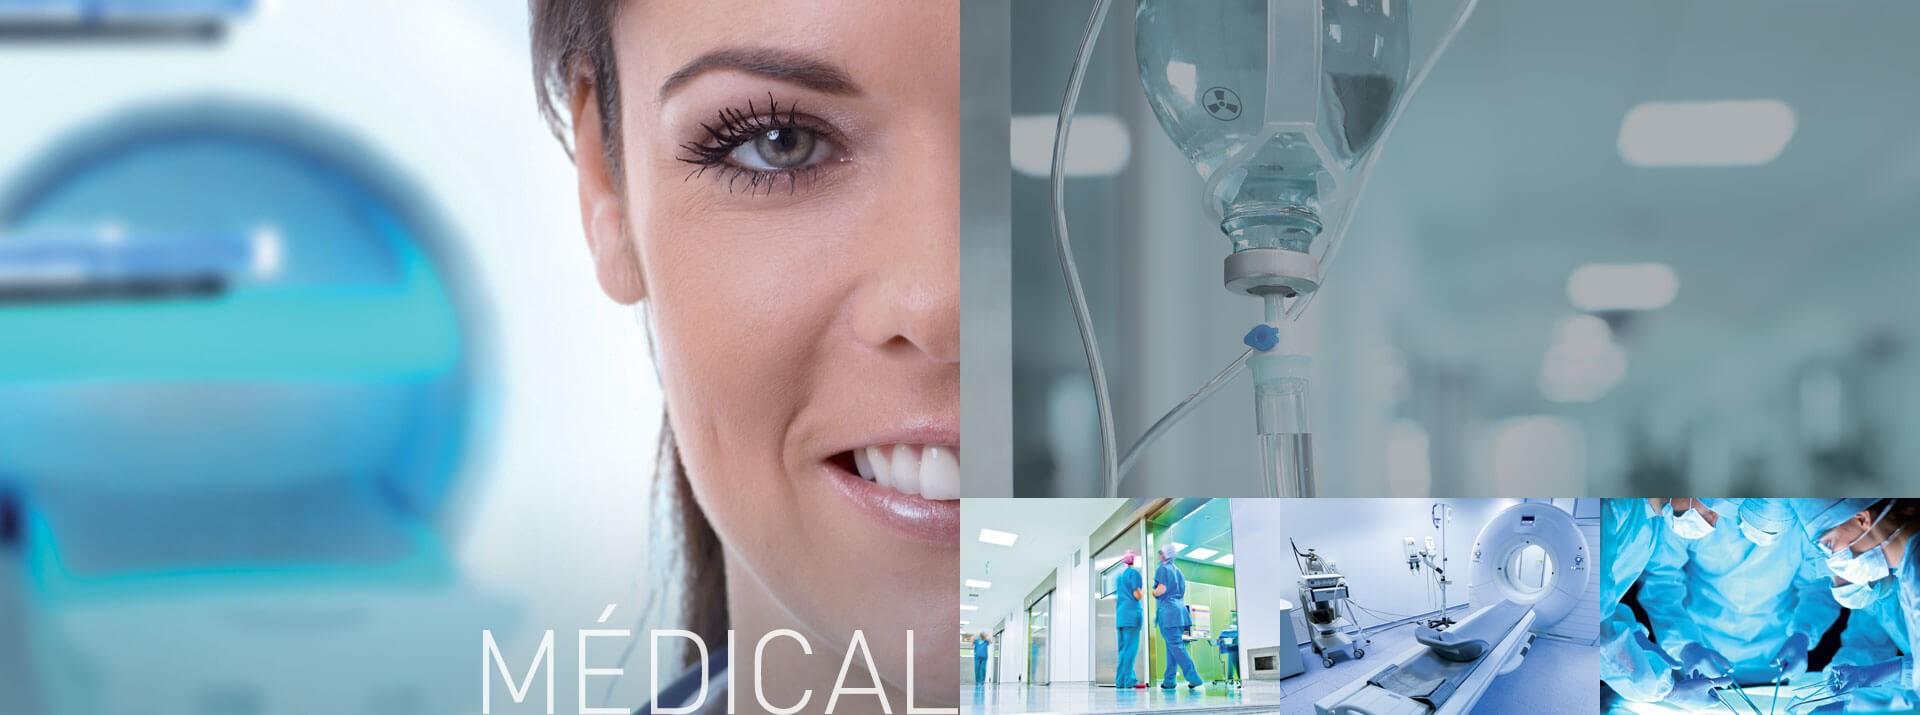 apvl-medical